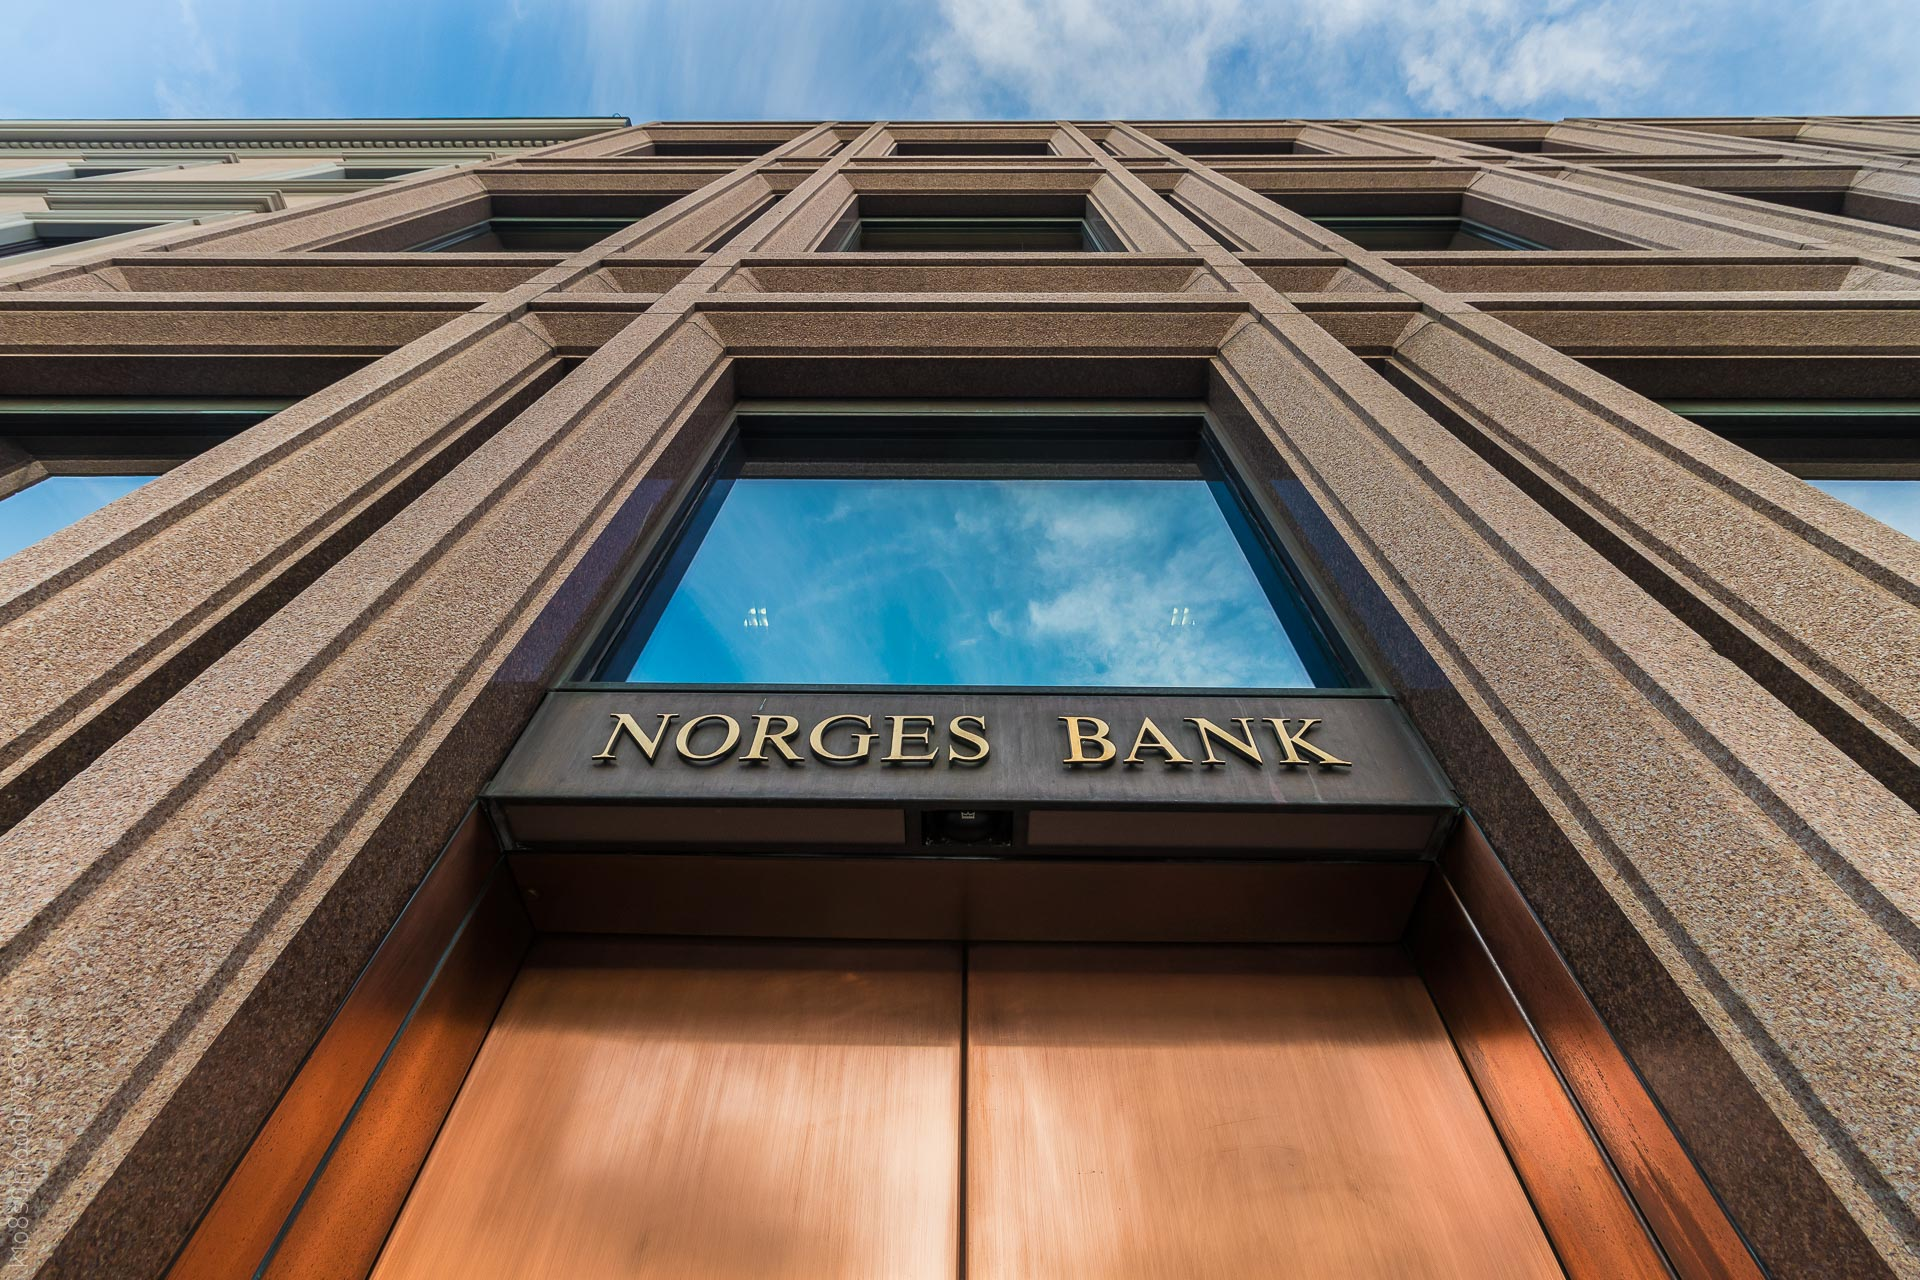 20180602-2936-CopyrightRobinLund-Norges-Bank